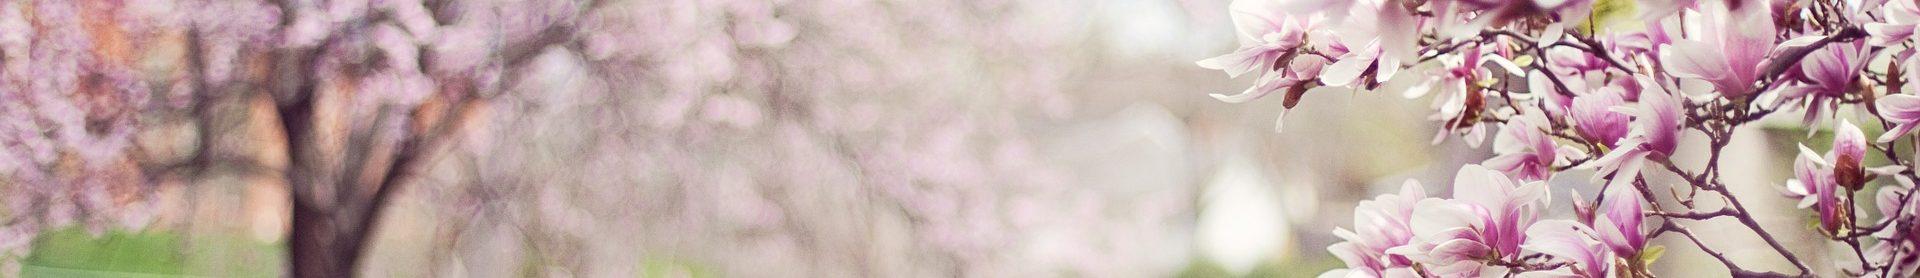 traumasensibles Yoga Magnolie